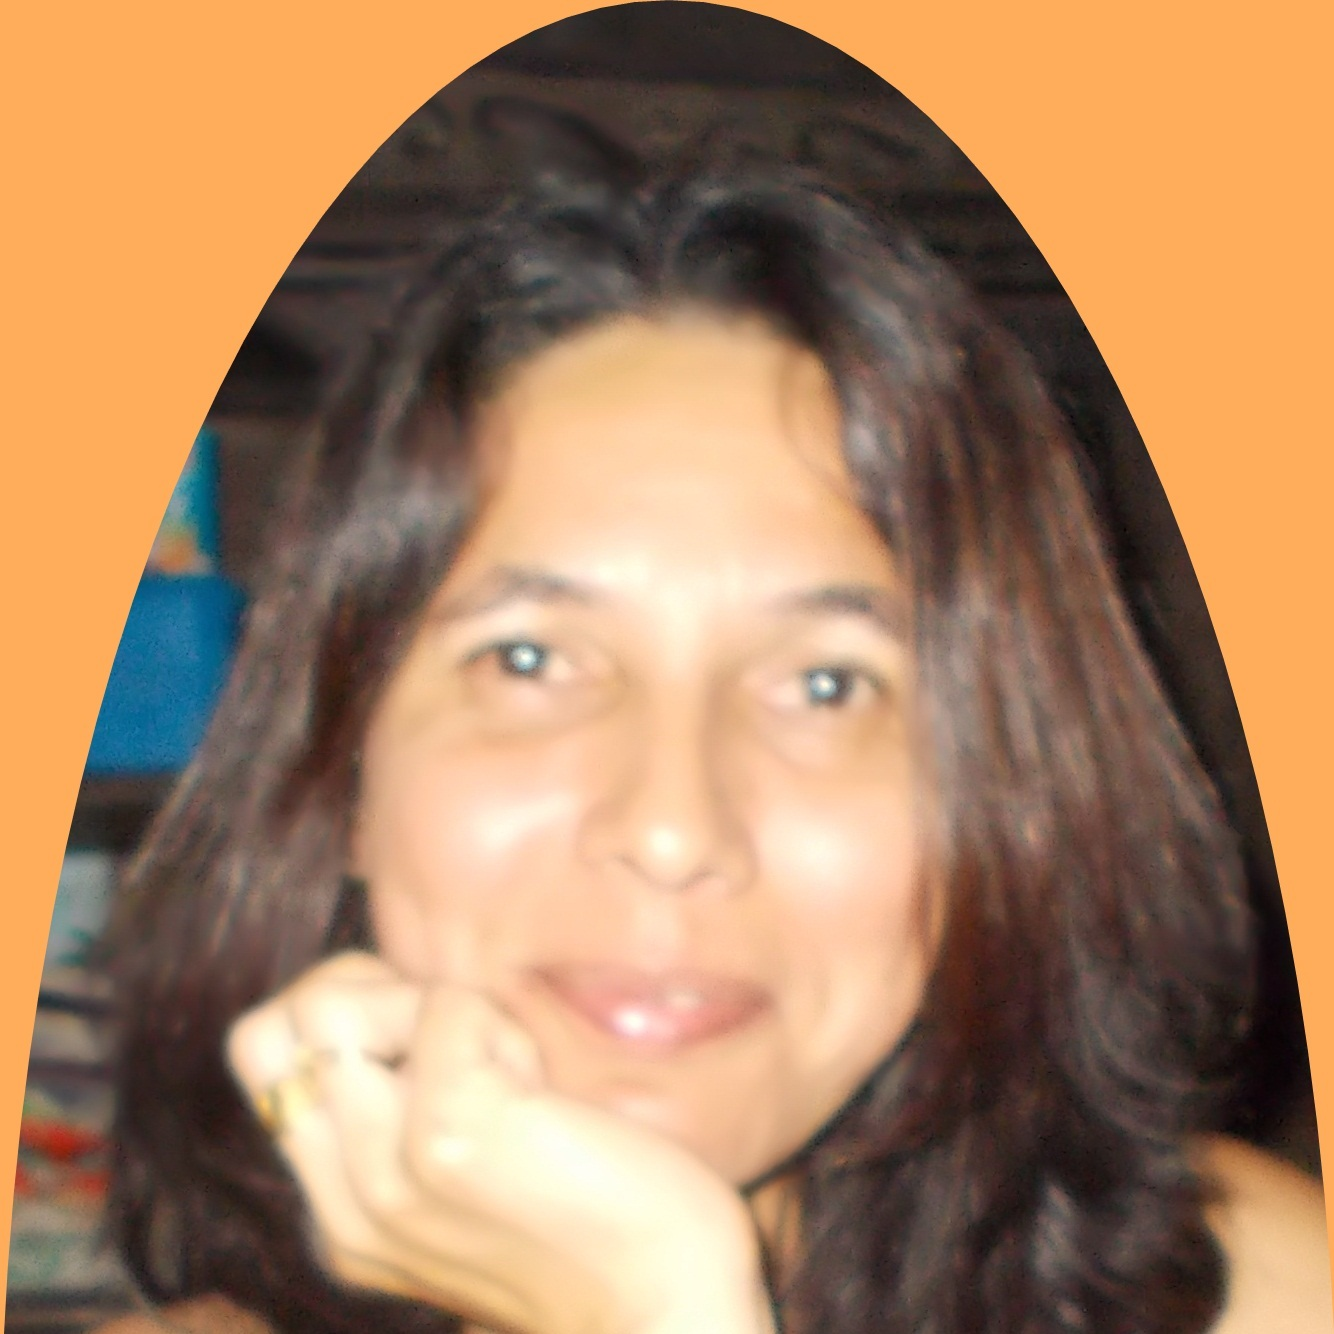 Carmilene Silva